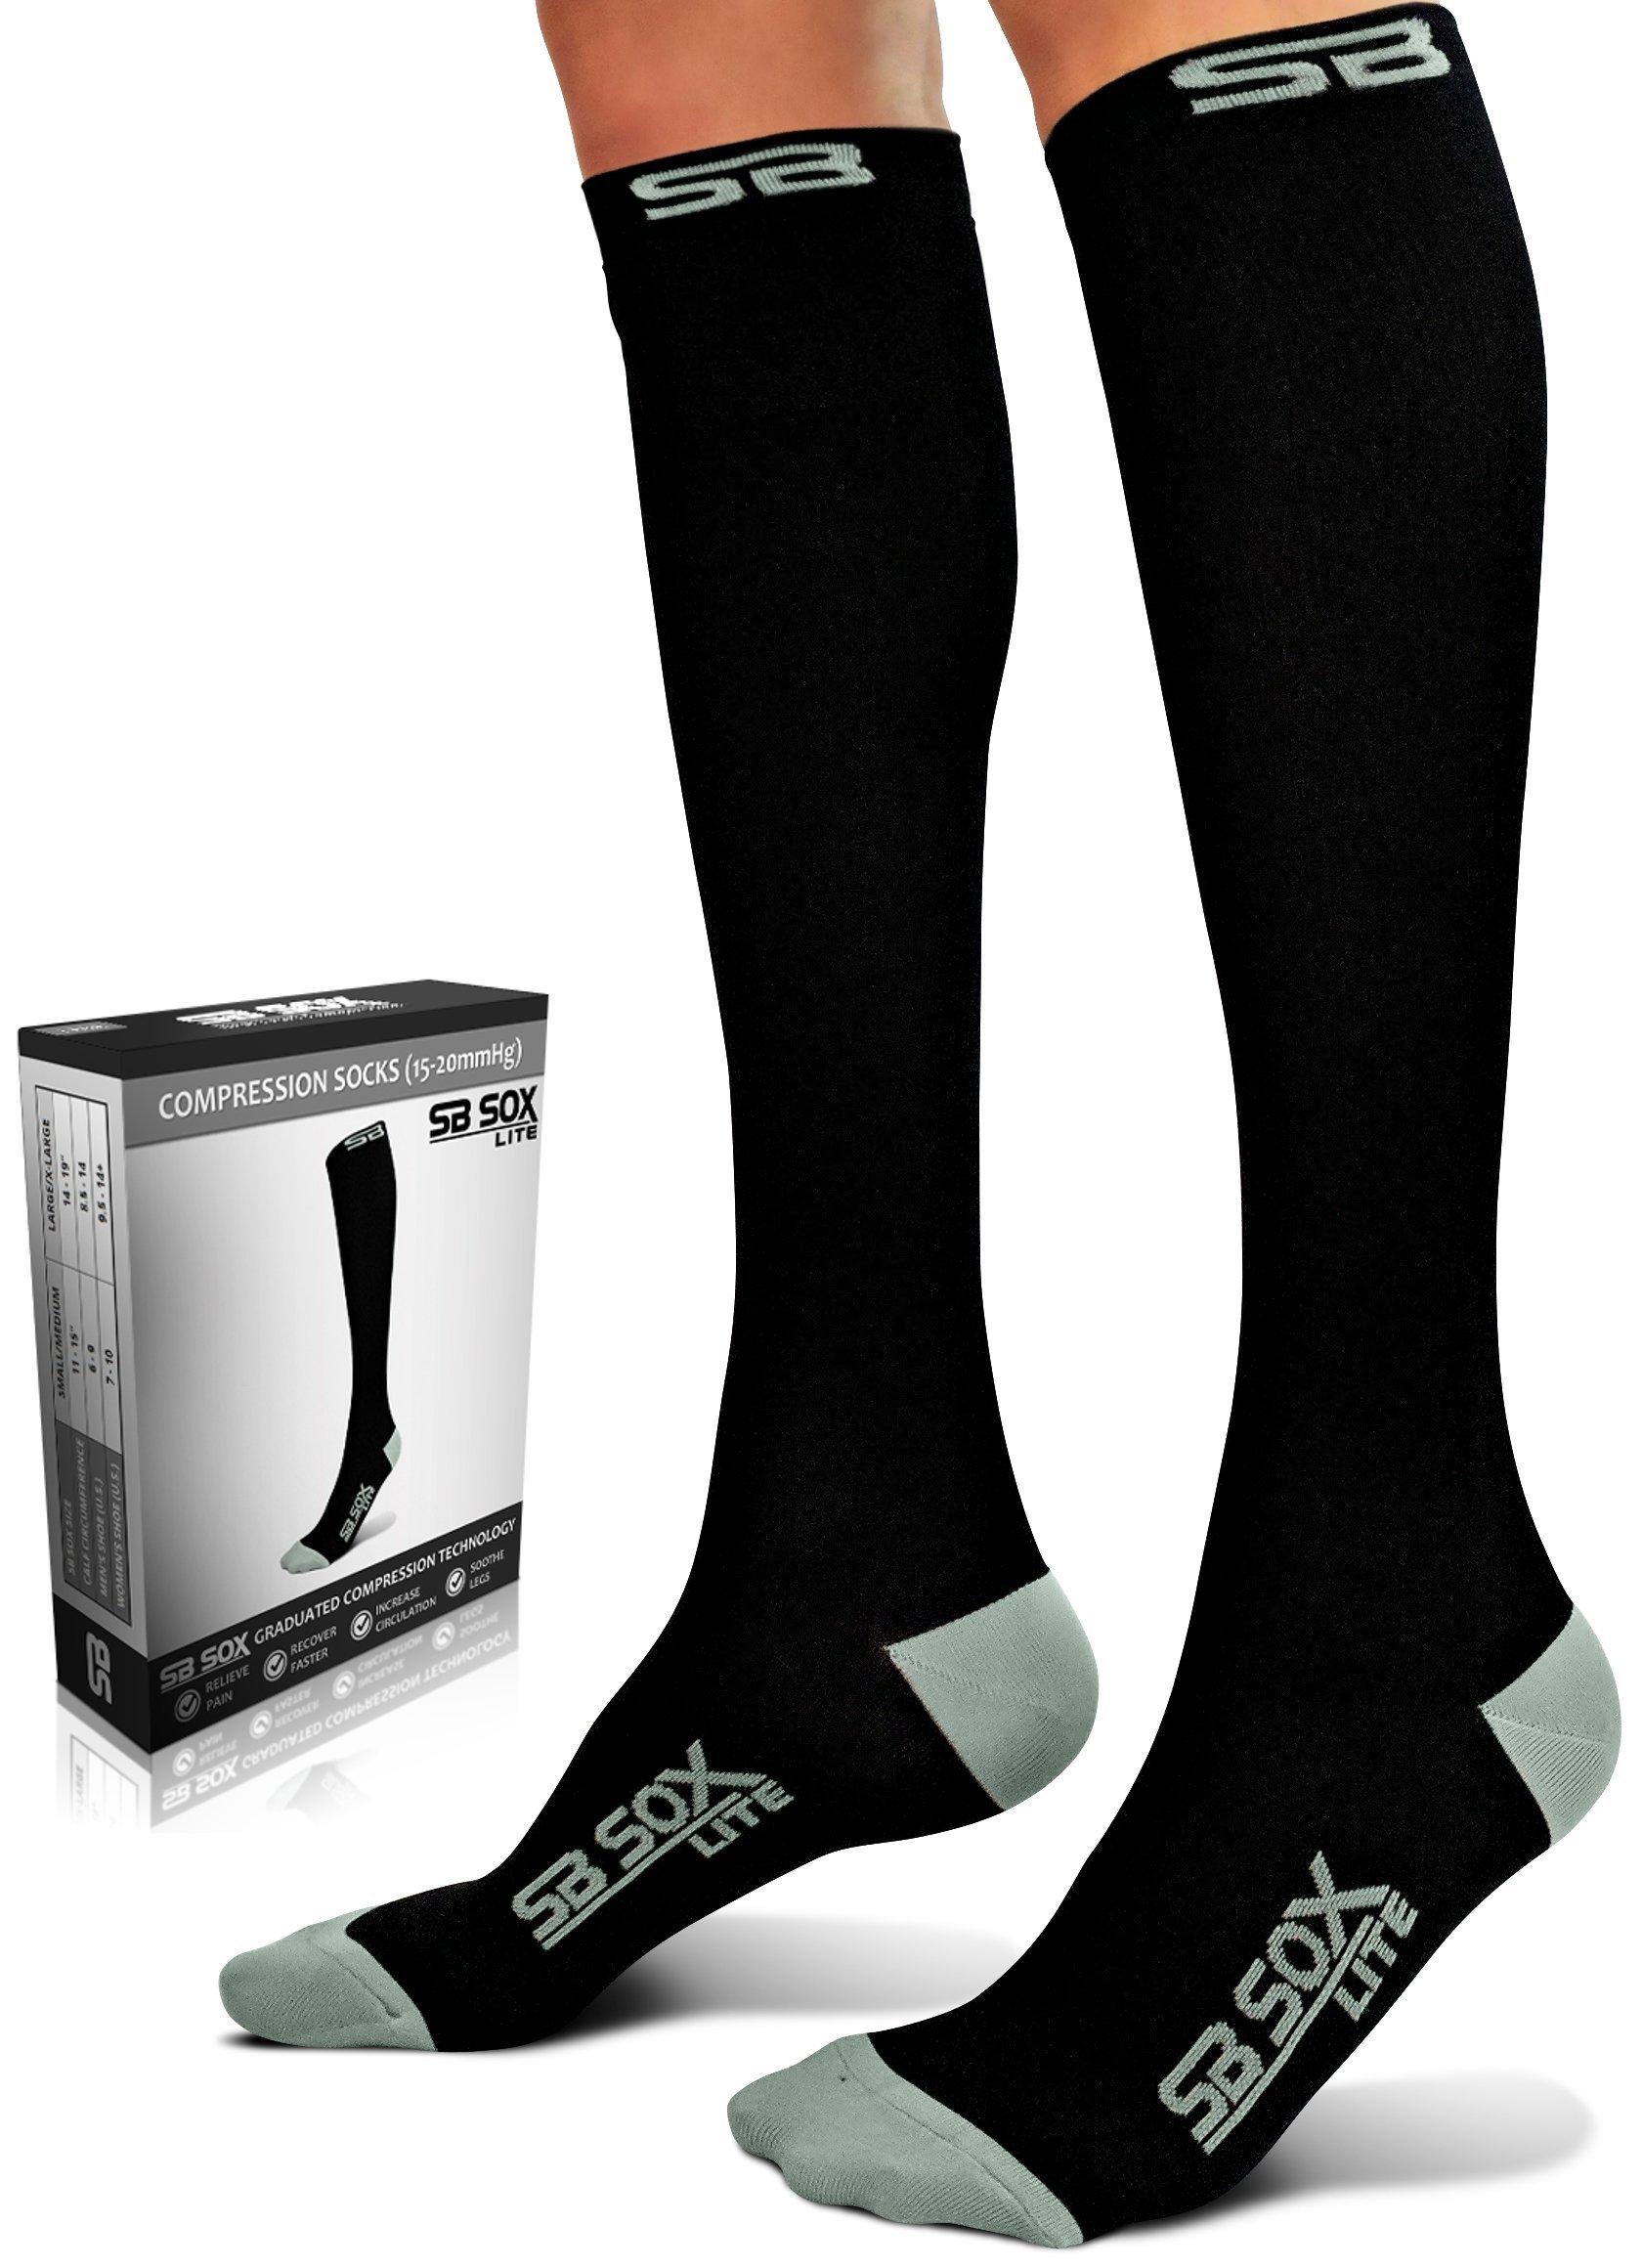 SB SOX Lite Compression Socks (15-20mmHg) for Men & Women - BEST Stockings for Running, Medical, Athletic, Edema, Diabetic, Varicose Veins, Travel, Pregnancy, Shin Splints, Nursing. (Black/Gray, L/XL)